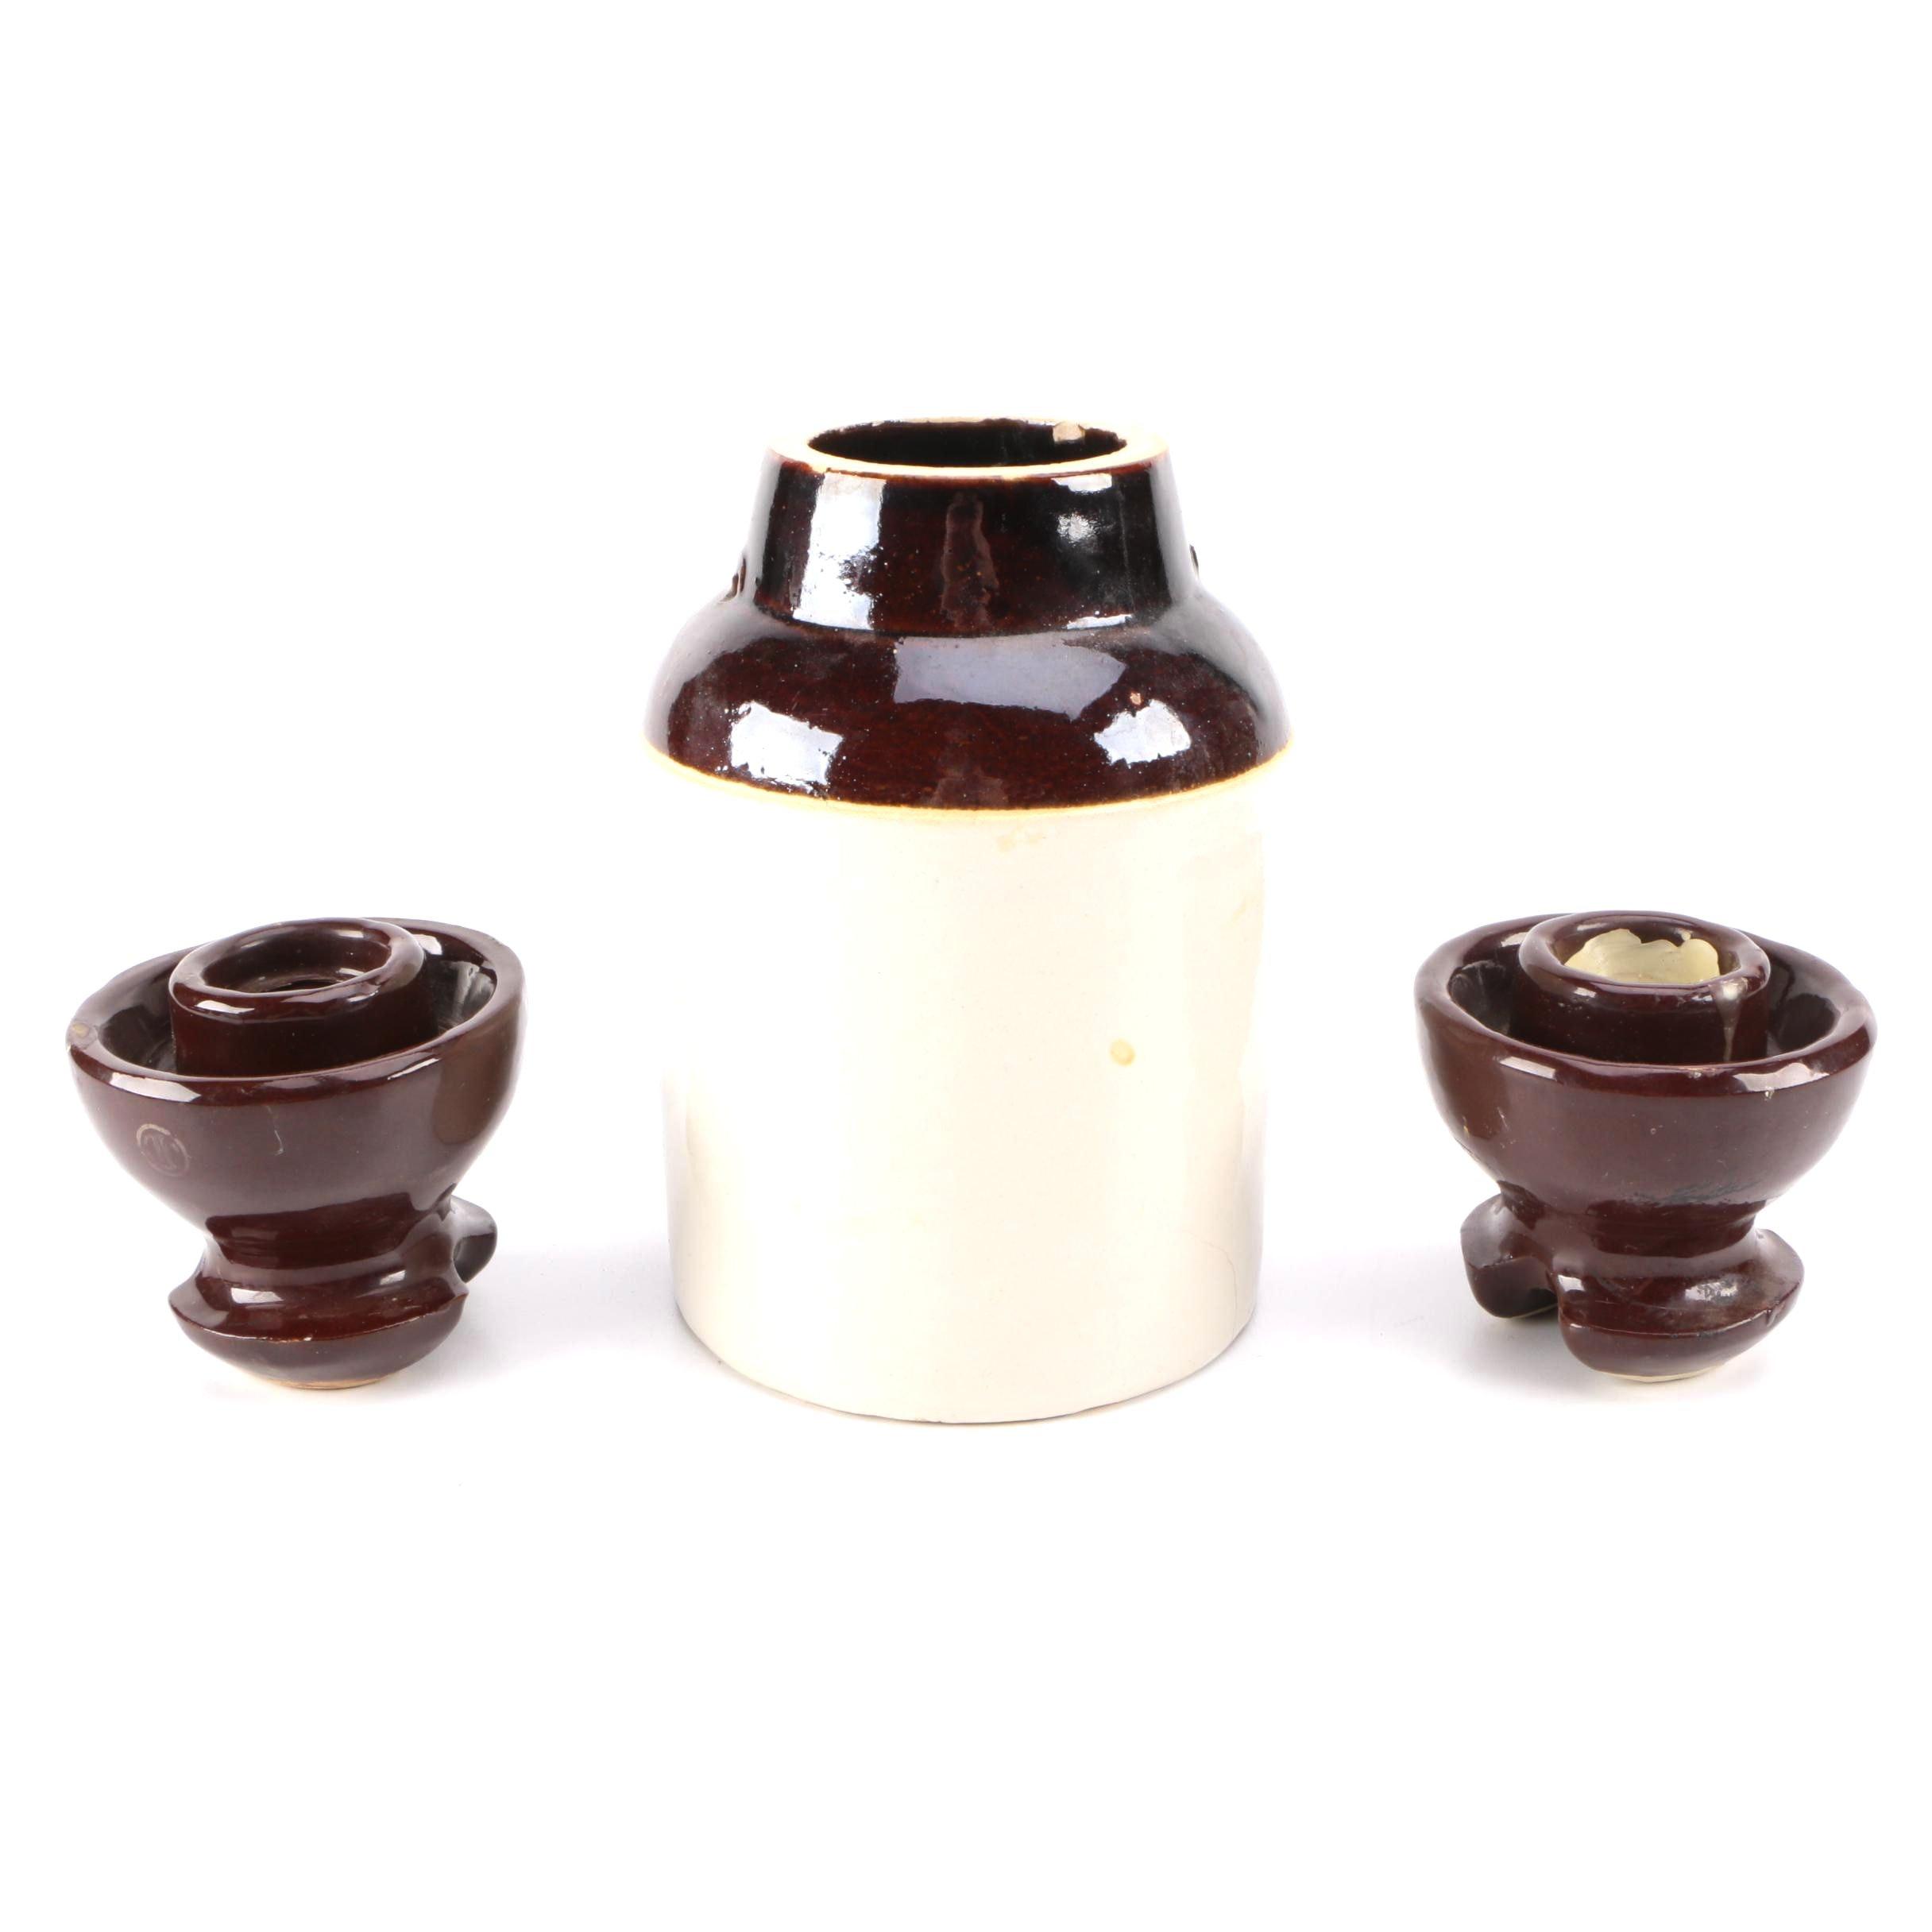 Brown Glazed Stoneware Vase and Candlesticks